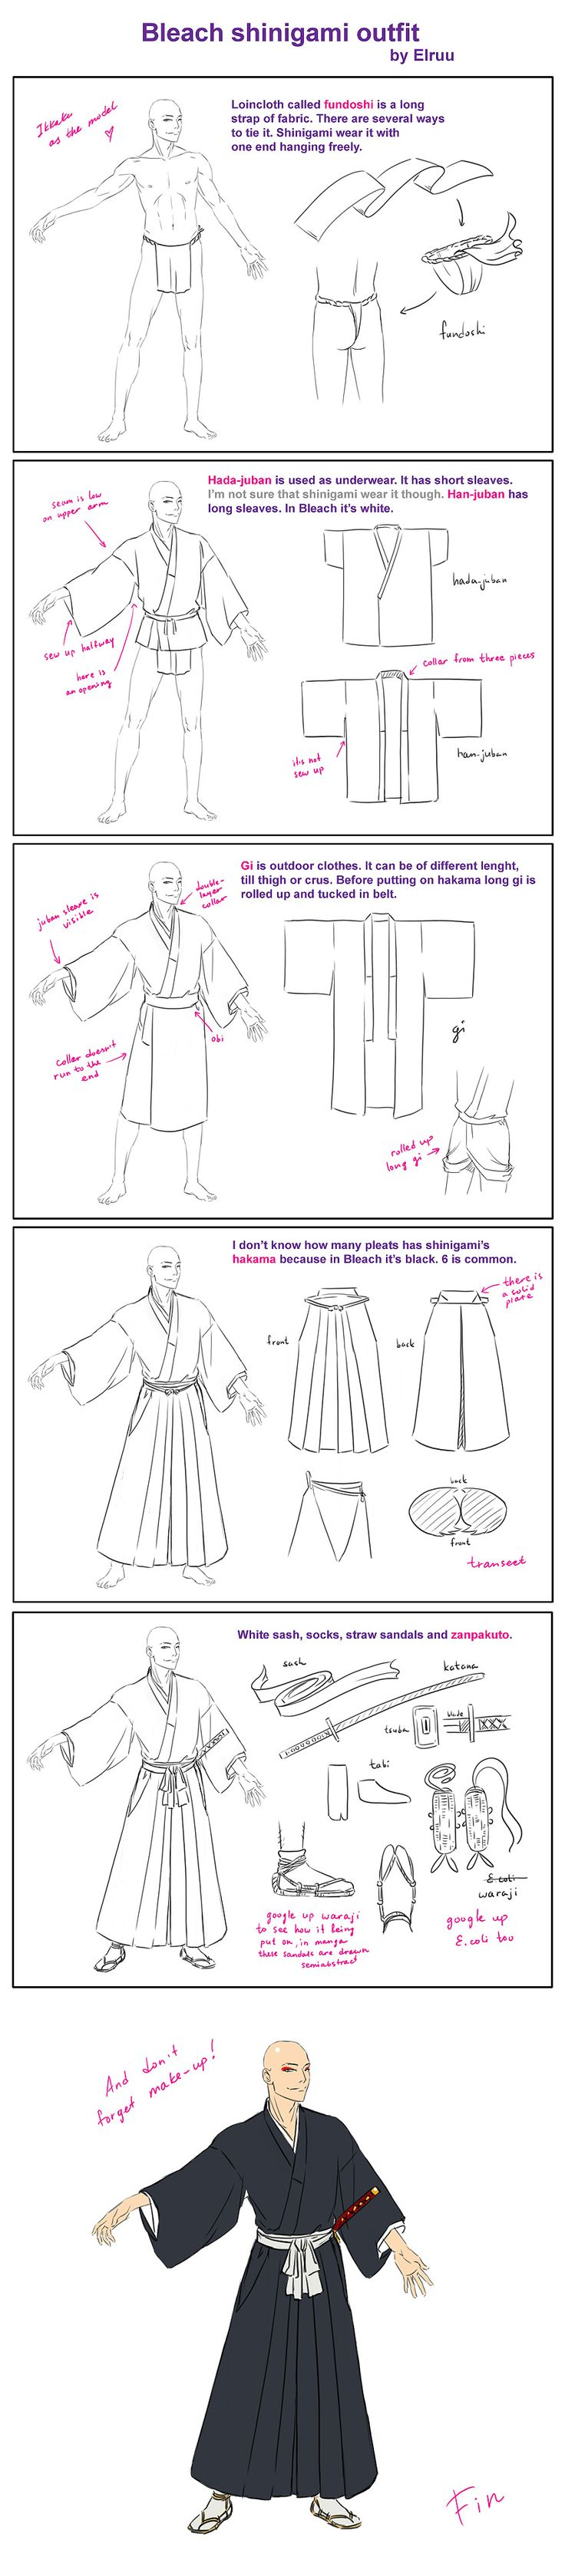 Bleach shinigami outfit by Elruu.deviantart.com on @deviantART